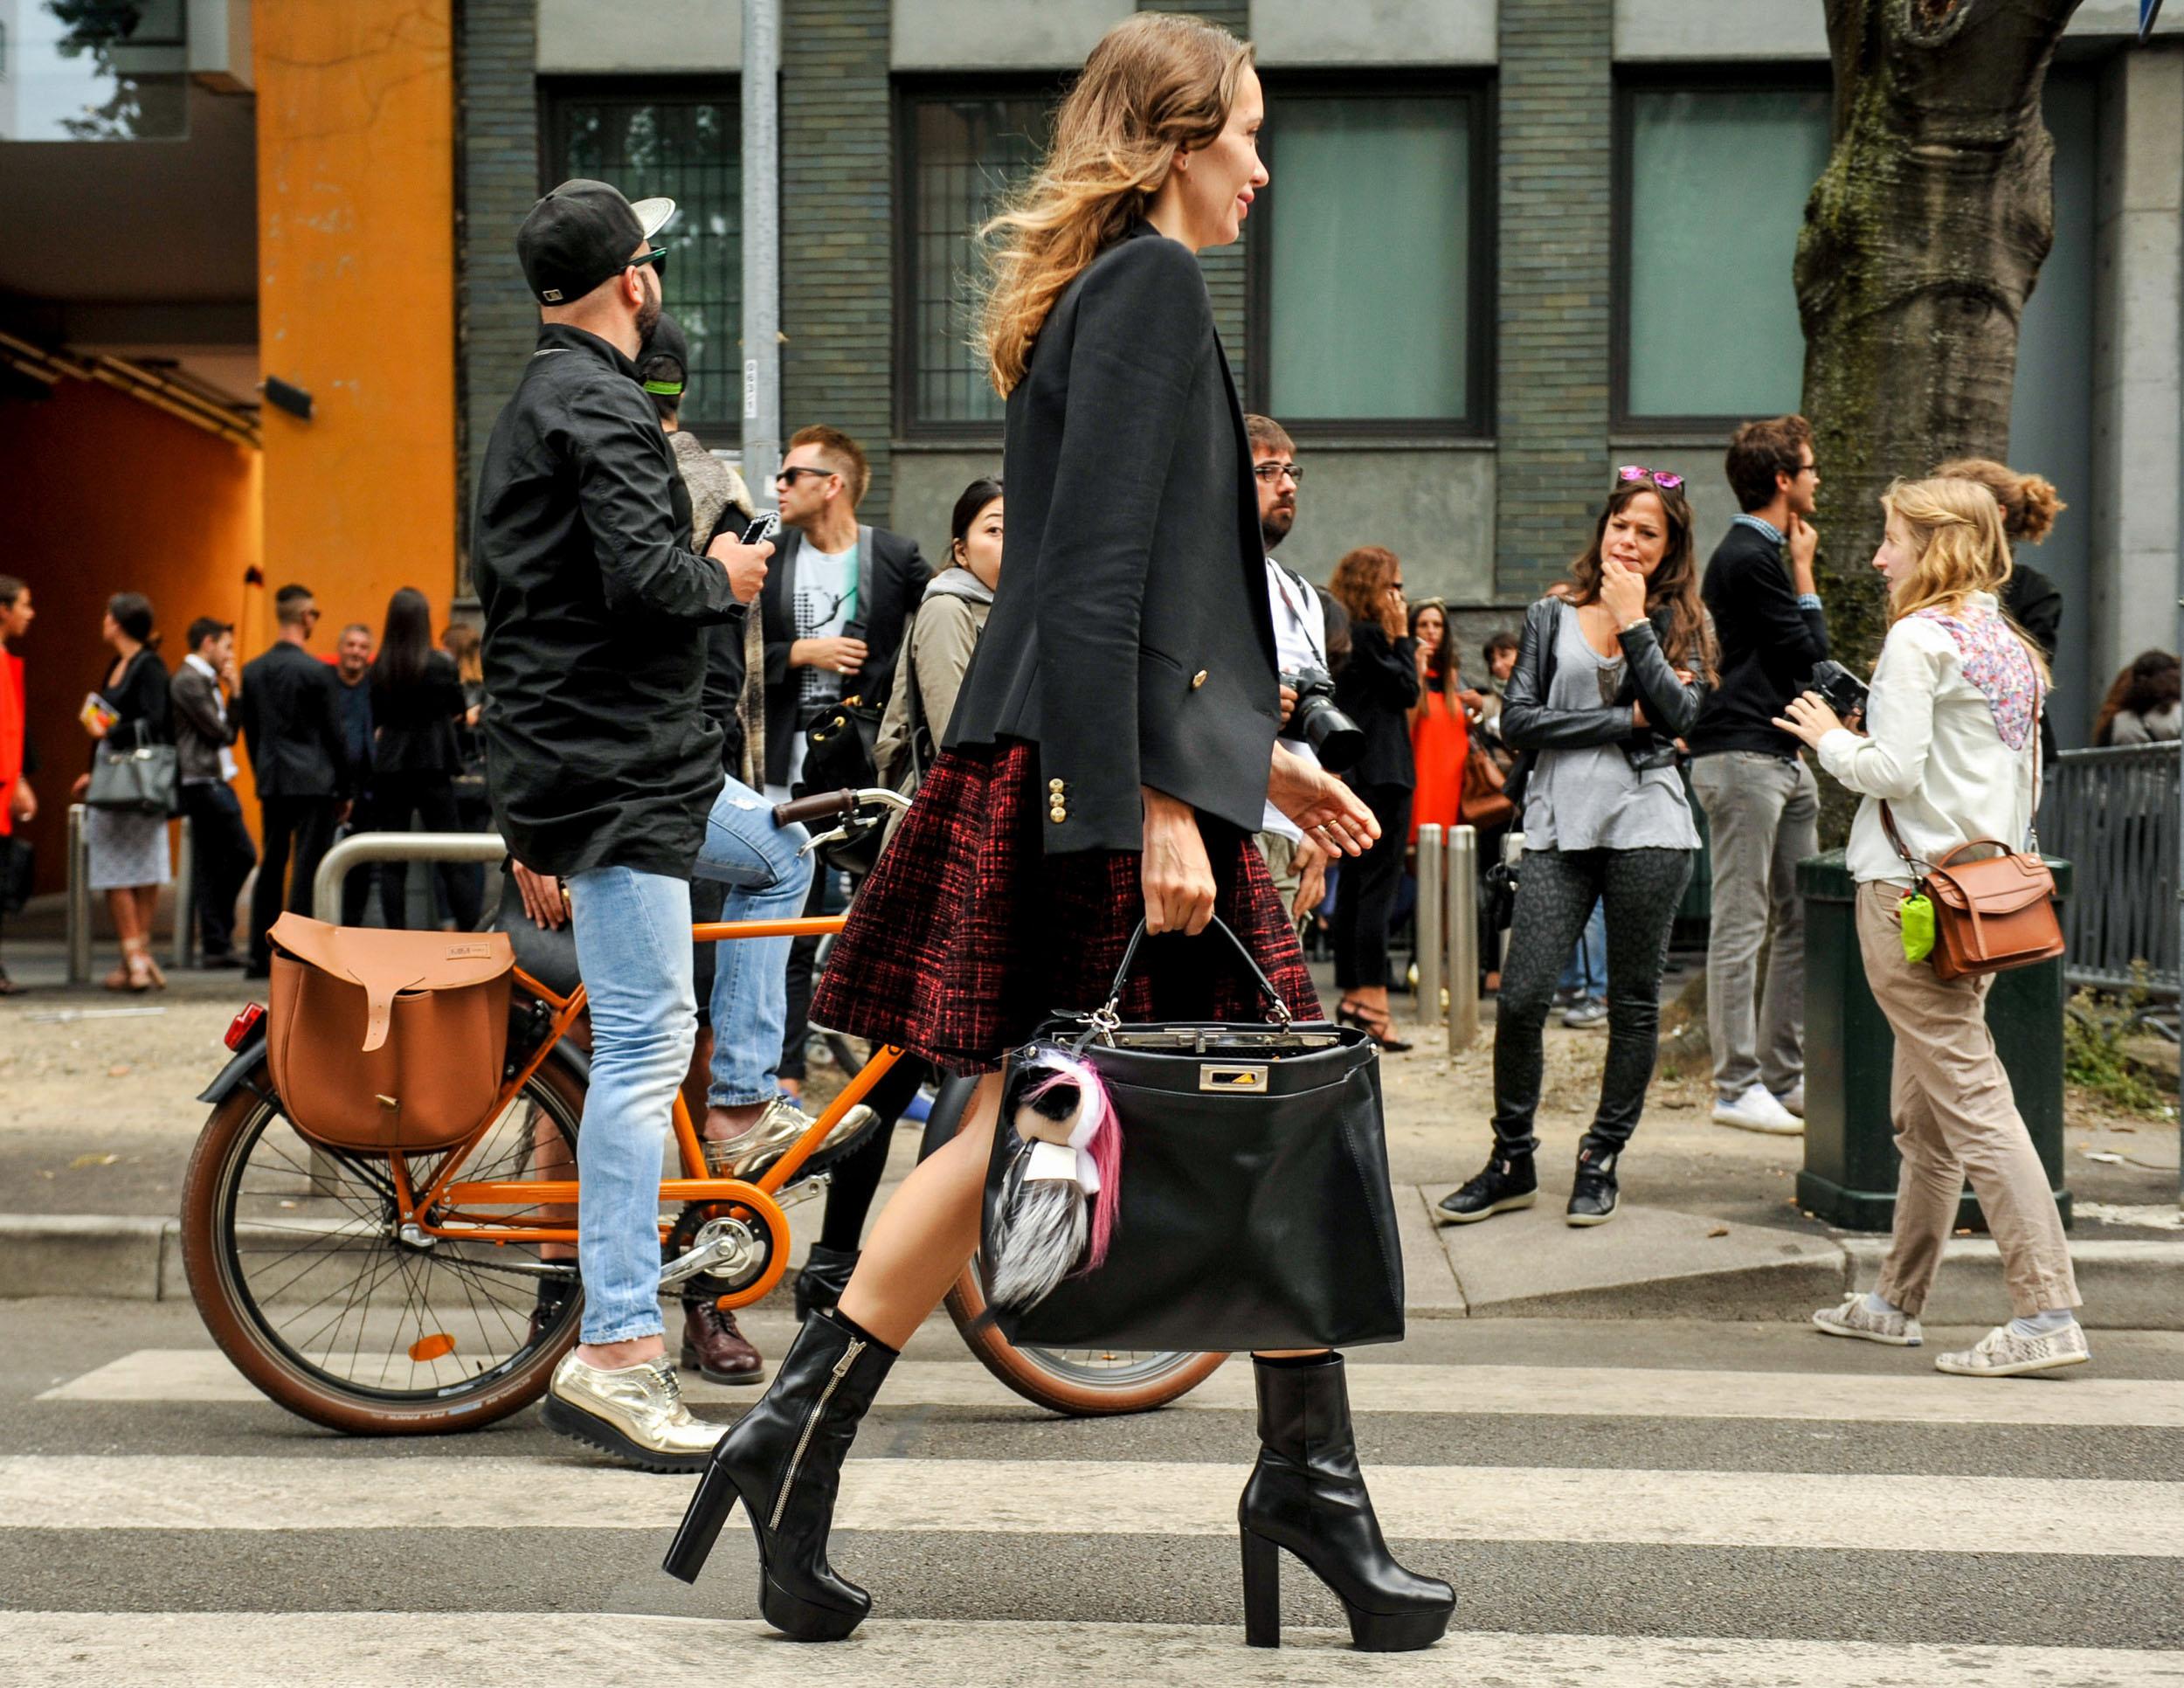 StreetStyle_Milan_LeandroJusten_154.jpg